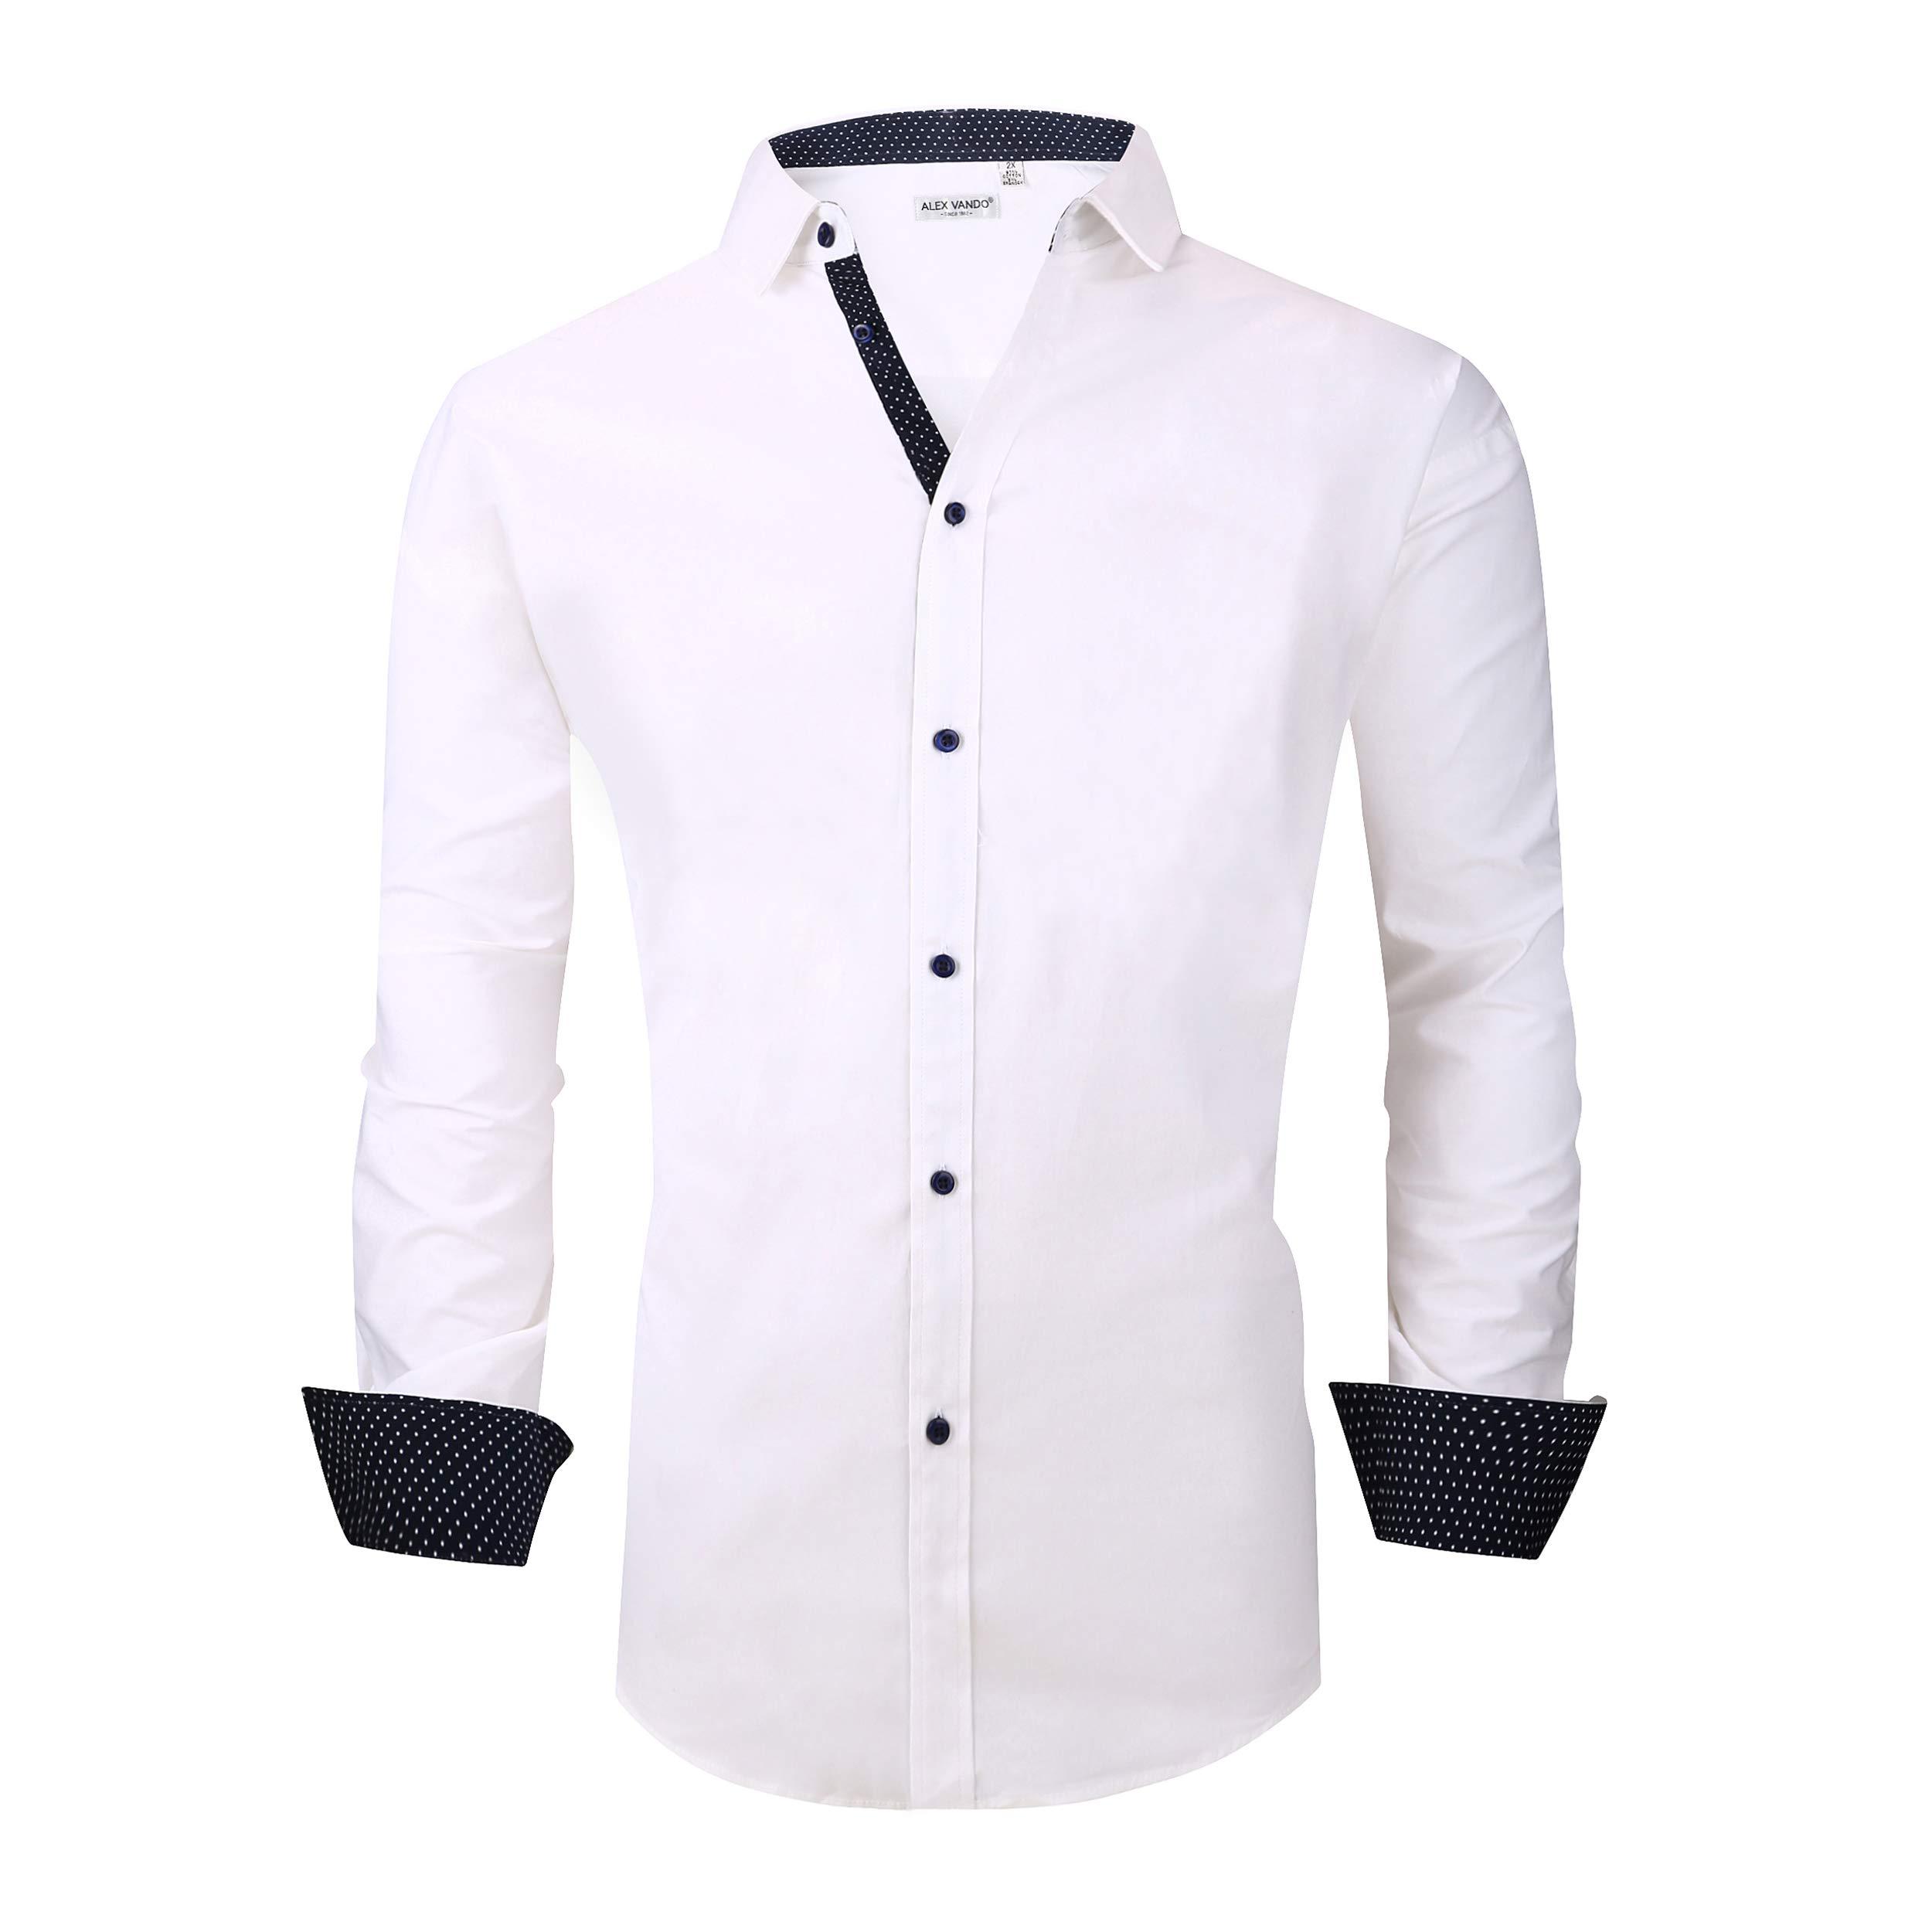 Alex Vando Mens Big & Tall Dress Shirts Regular Fit Long Sleeve Men Shirt